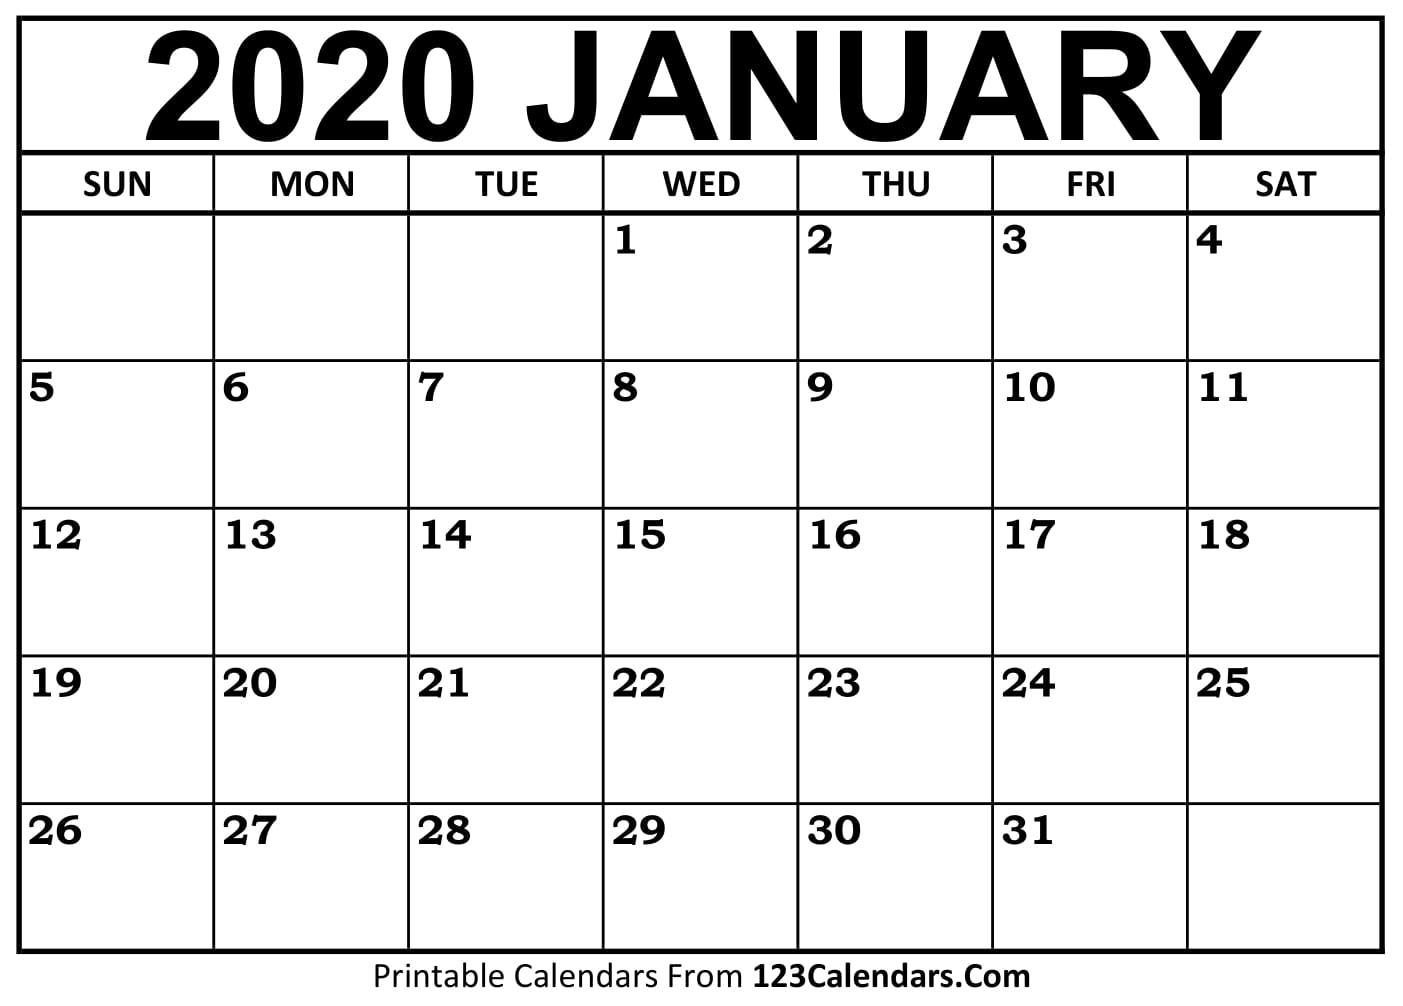 Free Printable Calendar   123Calendars inside Free Printable Calendar With Lines